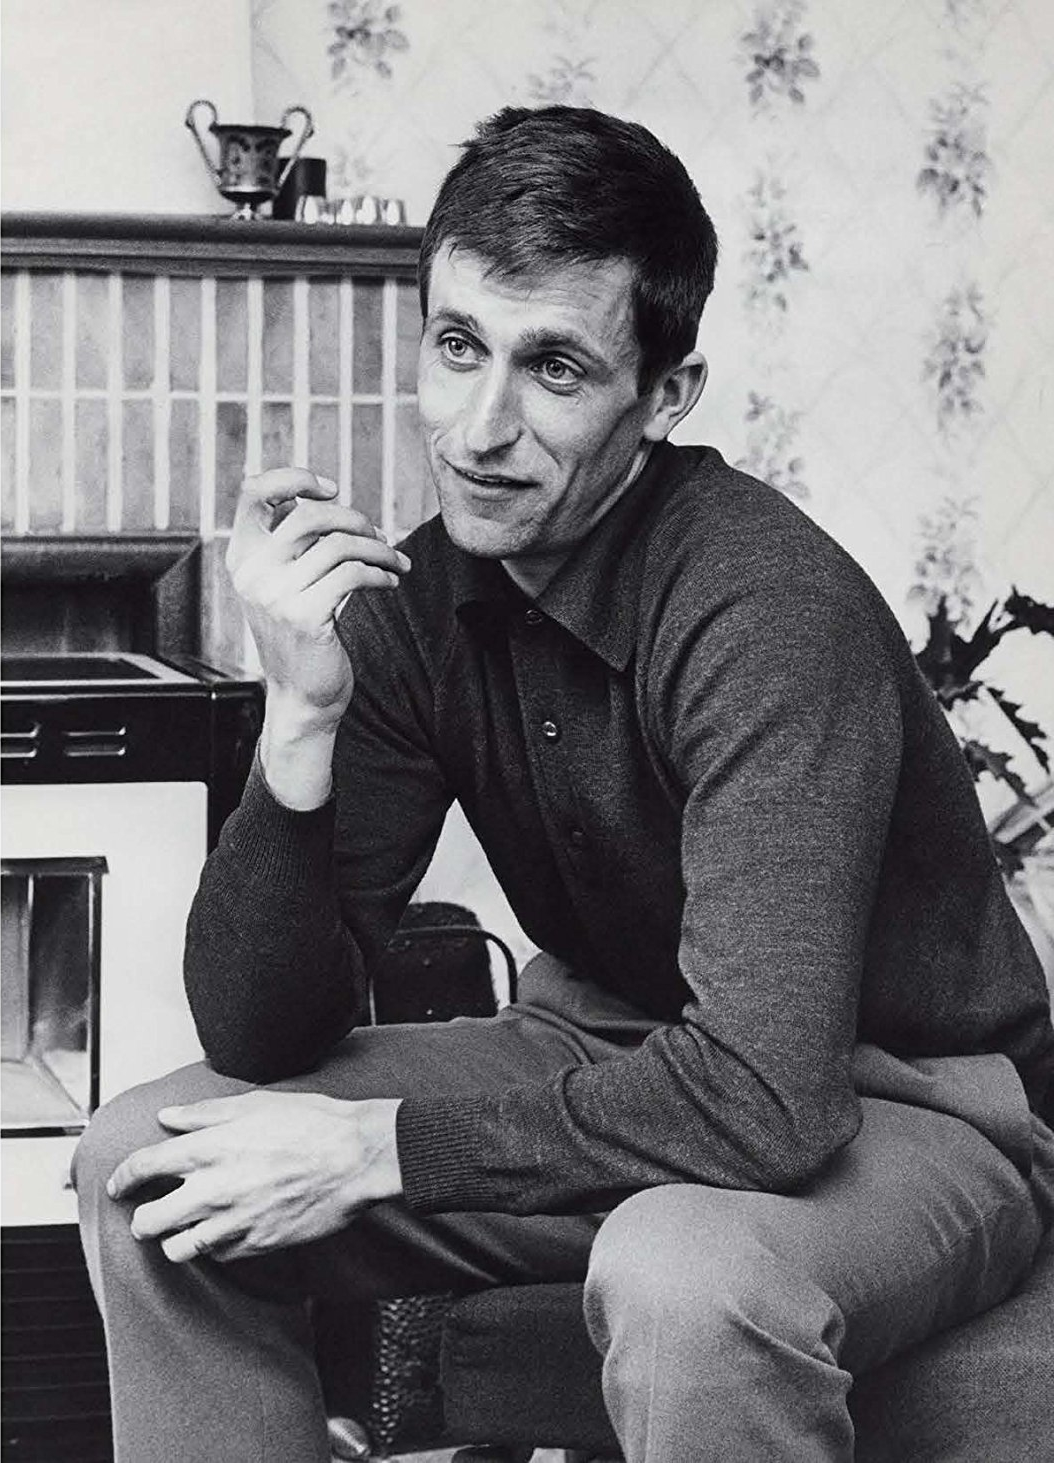 Tom Simpson - Ghent, 1965